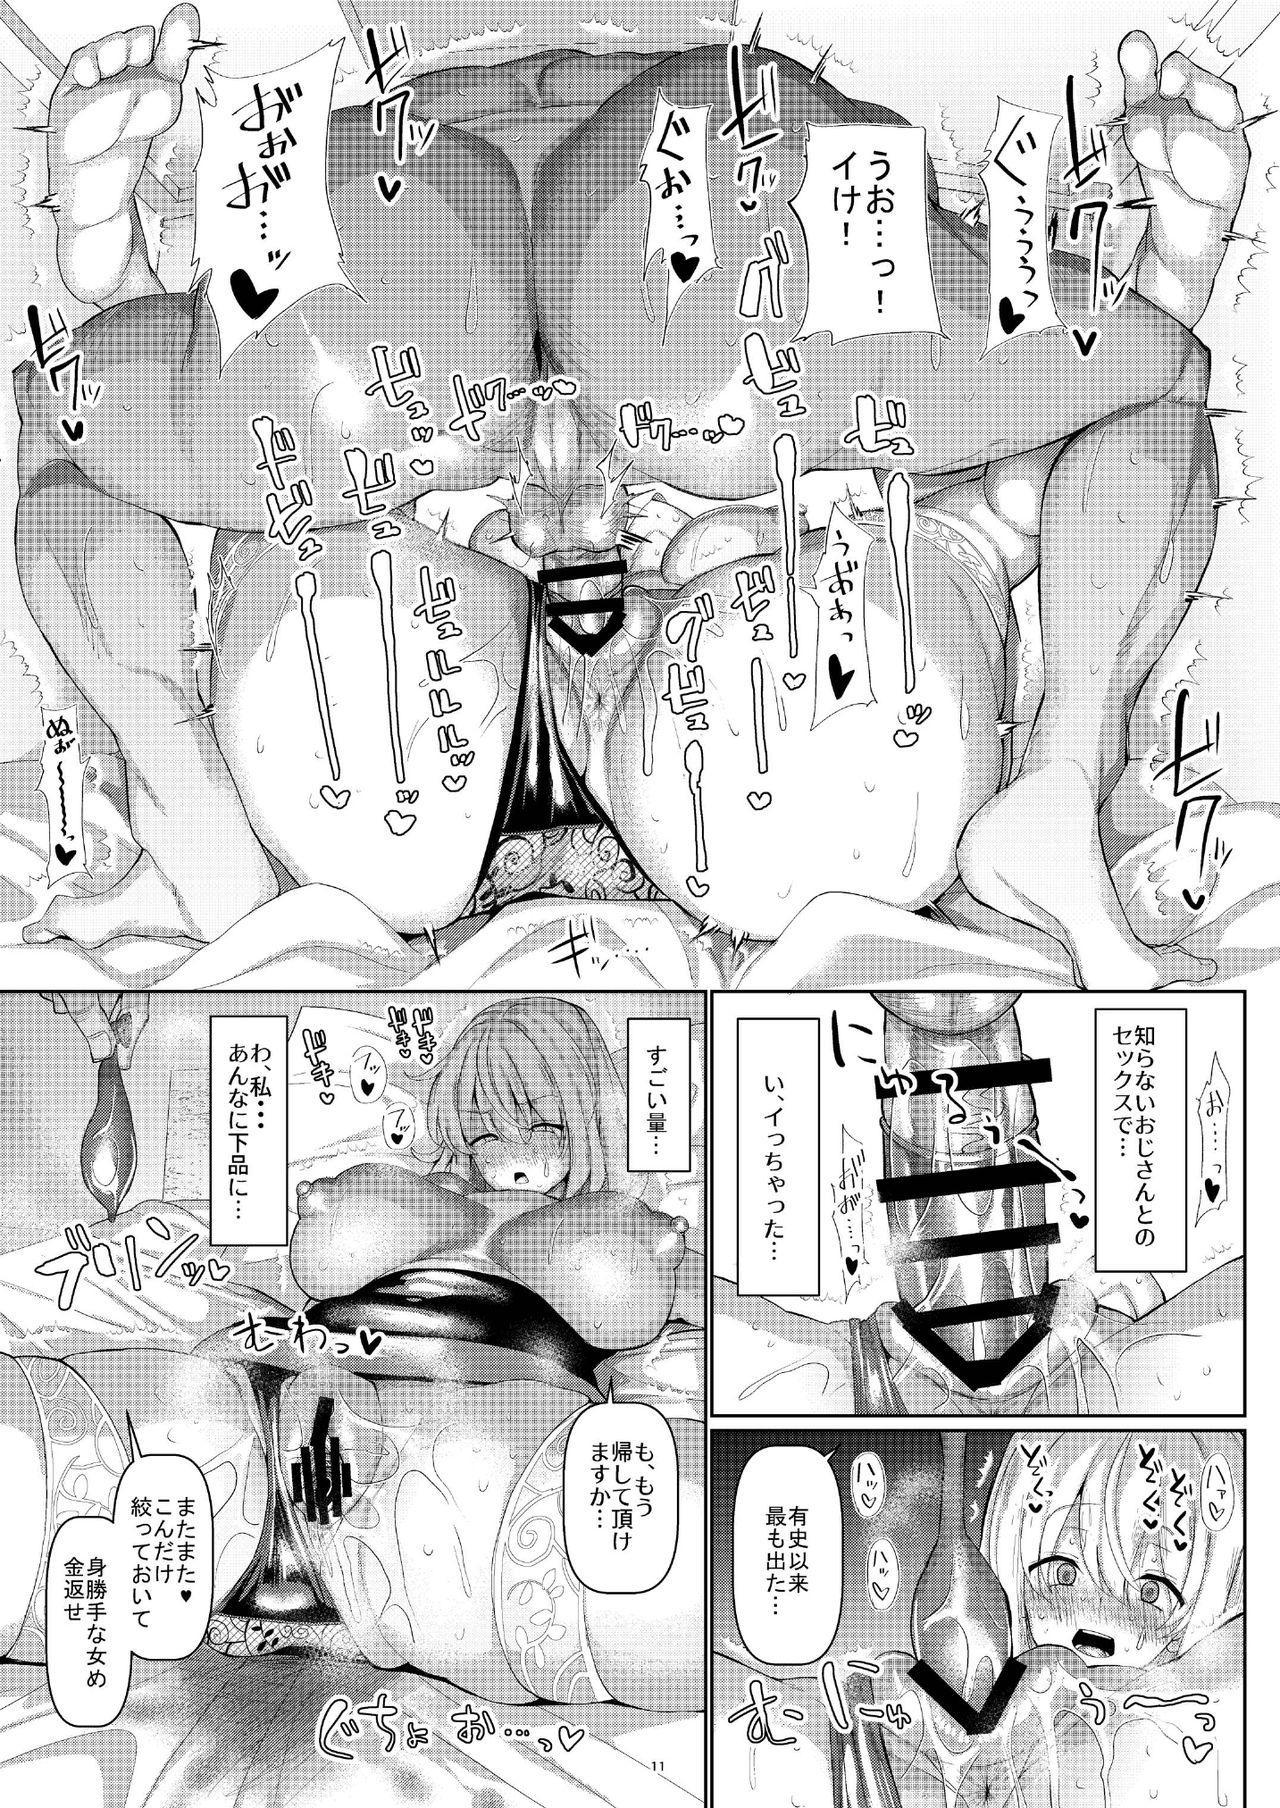 BodyCon Merry no Ogehin Koubi 12